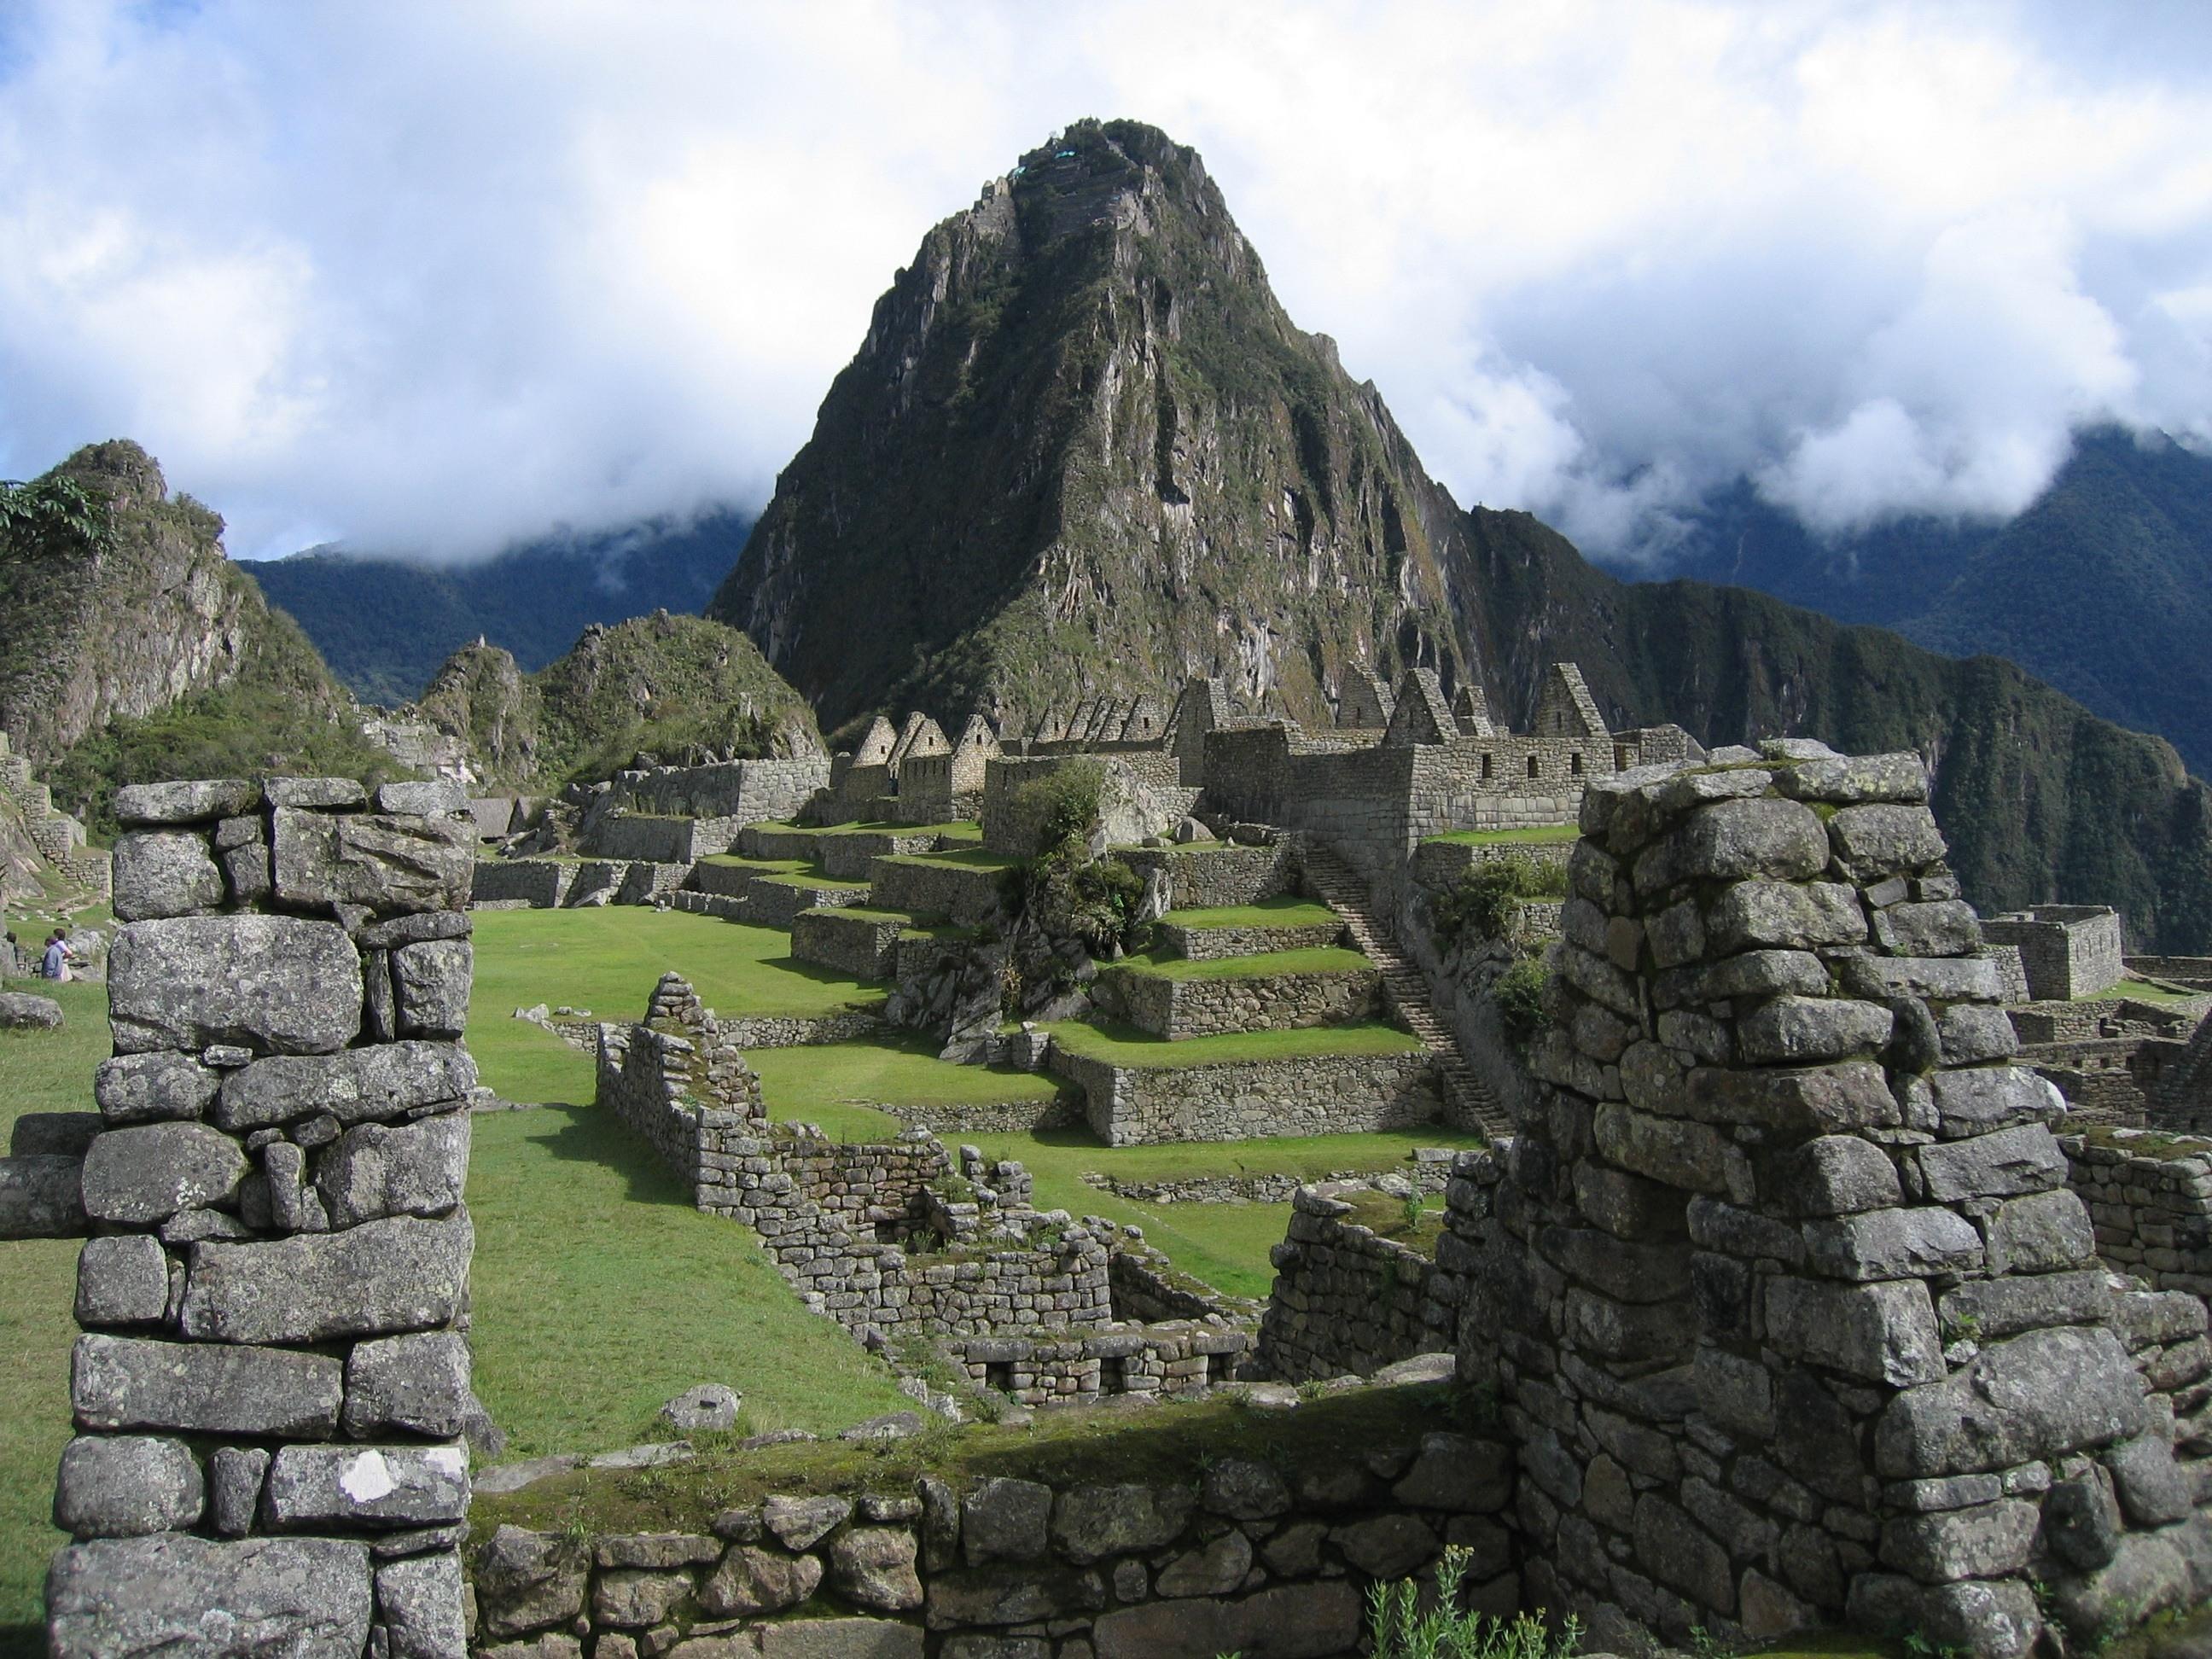 Trek dans les Andes : quels vêtements emporter ?